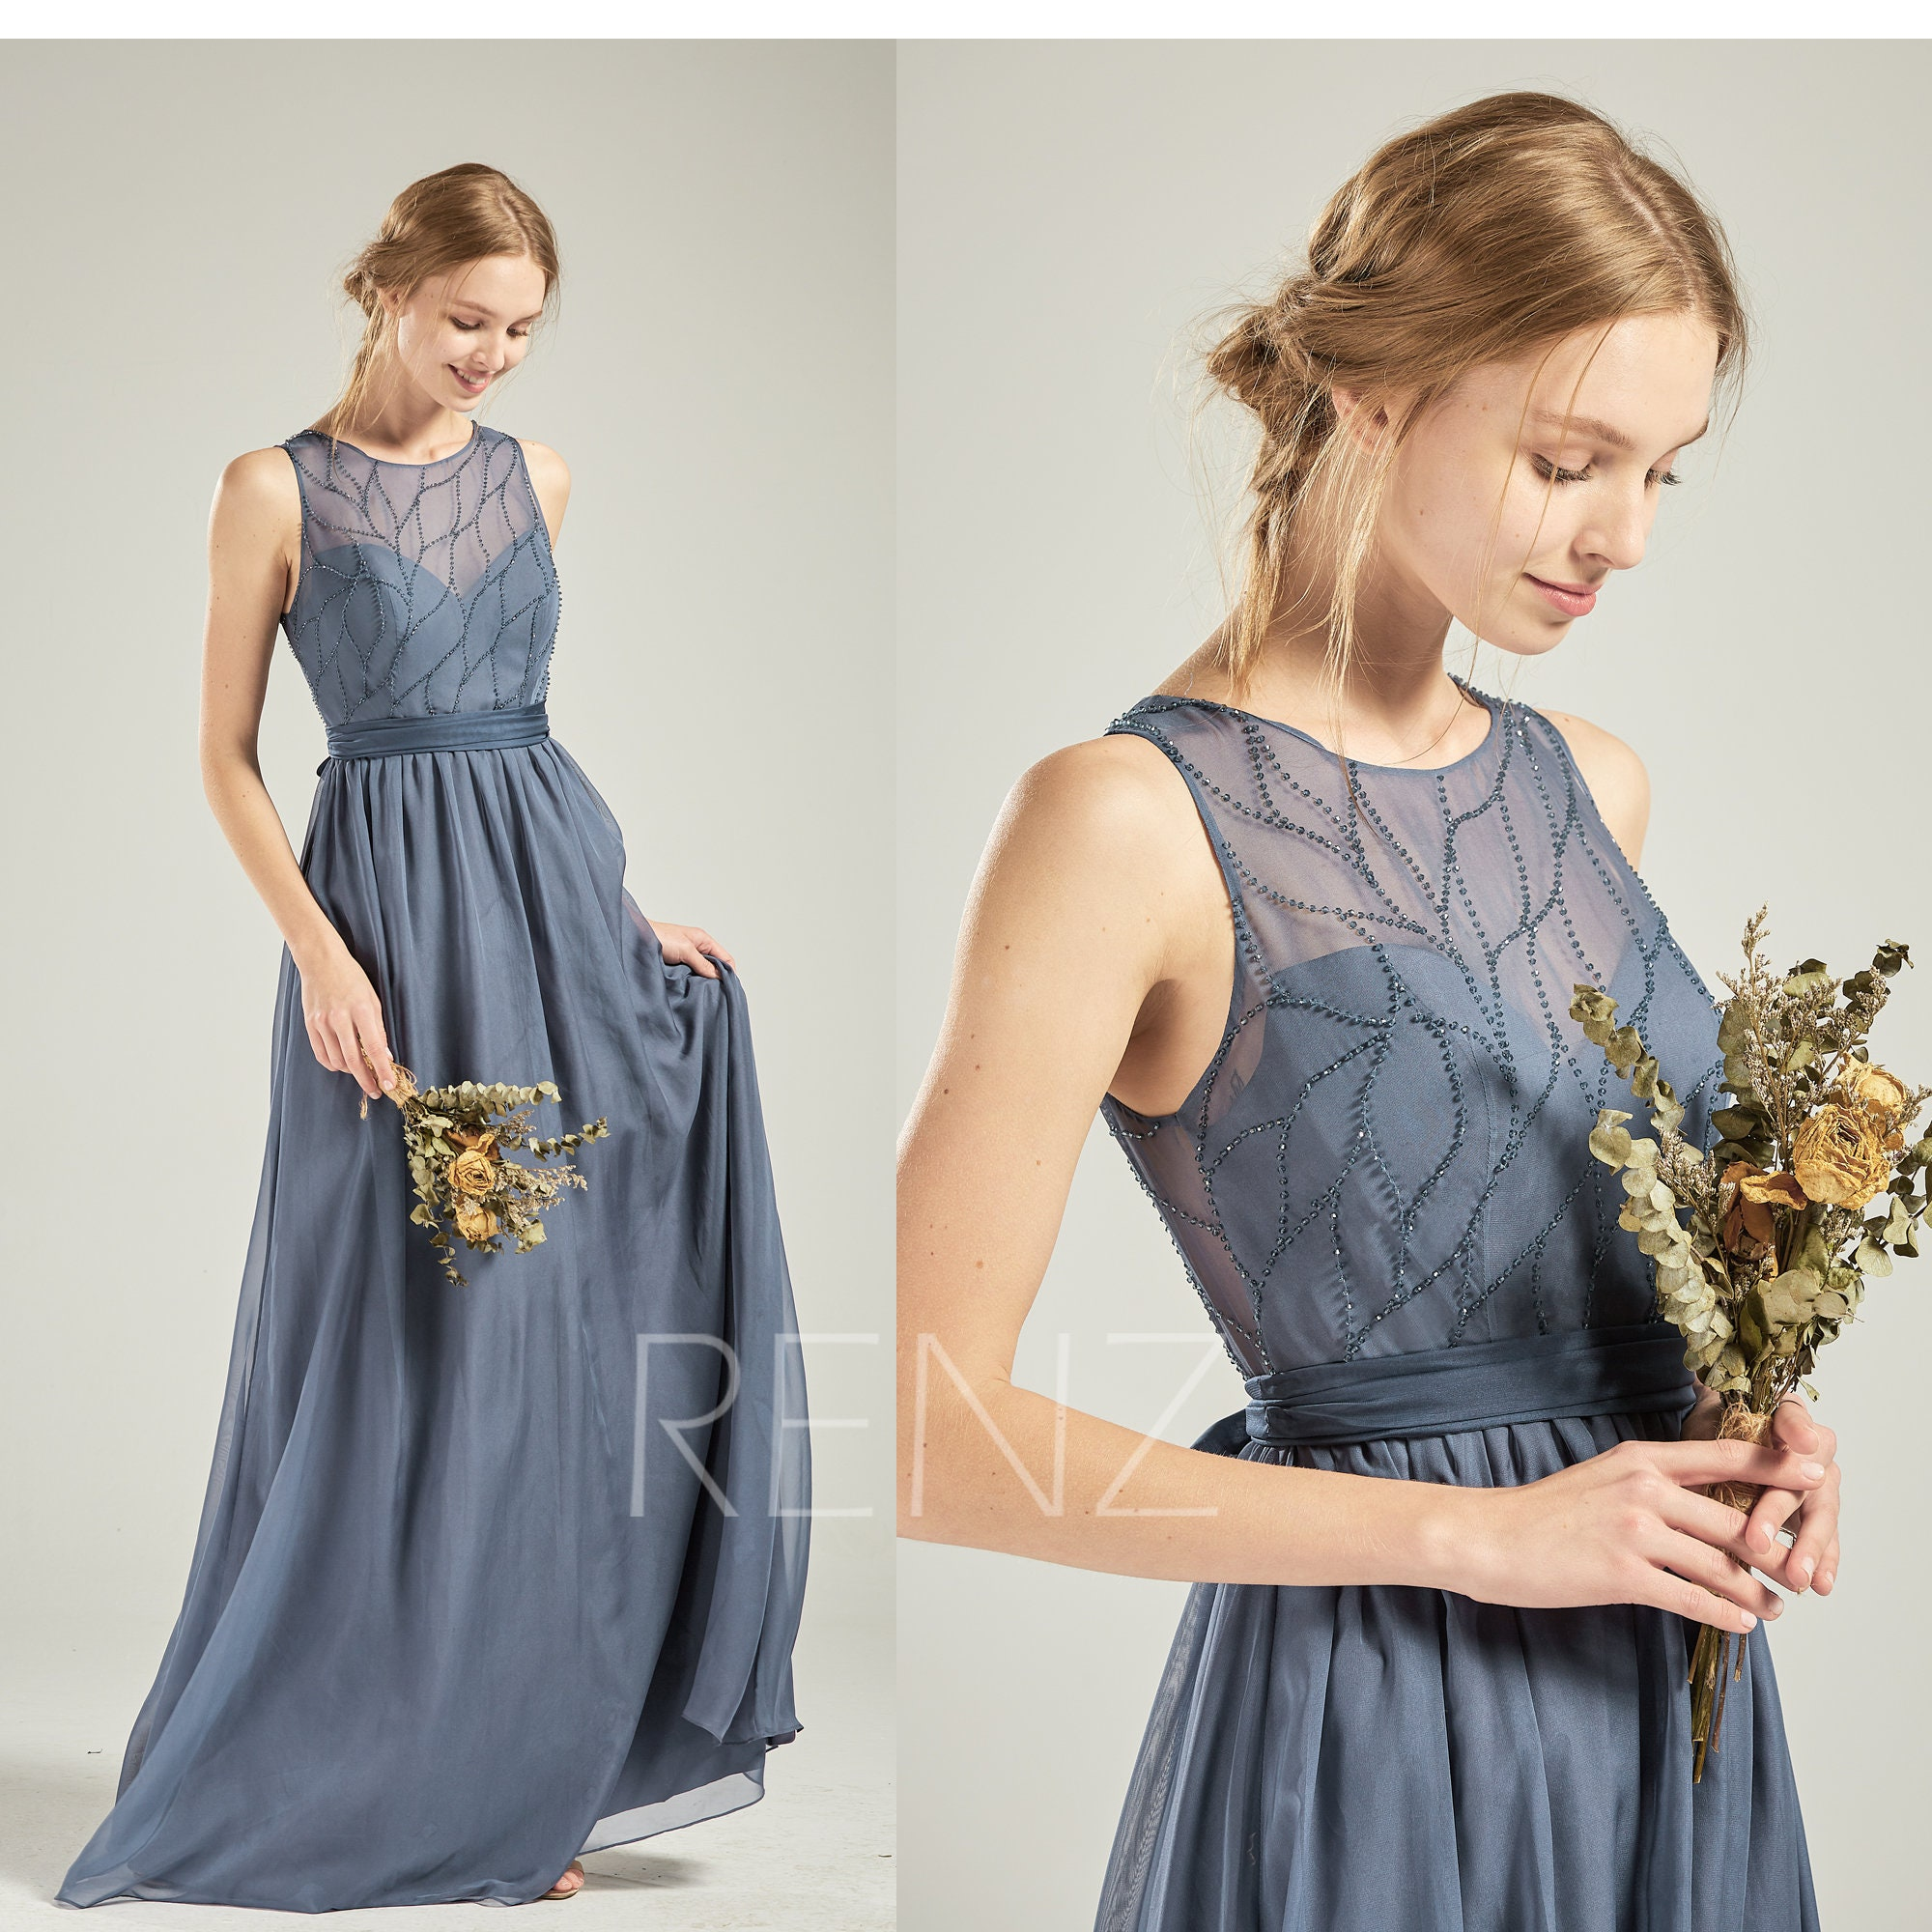 0d039d845c97 Bridesmaid Dress Dark Steel Blue Chiffon Dress Wedding Dress | Etsy